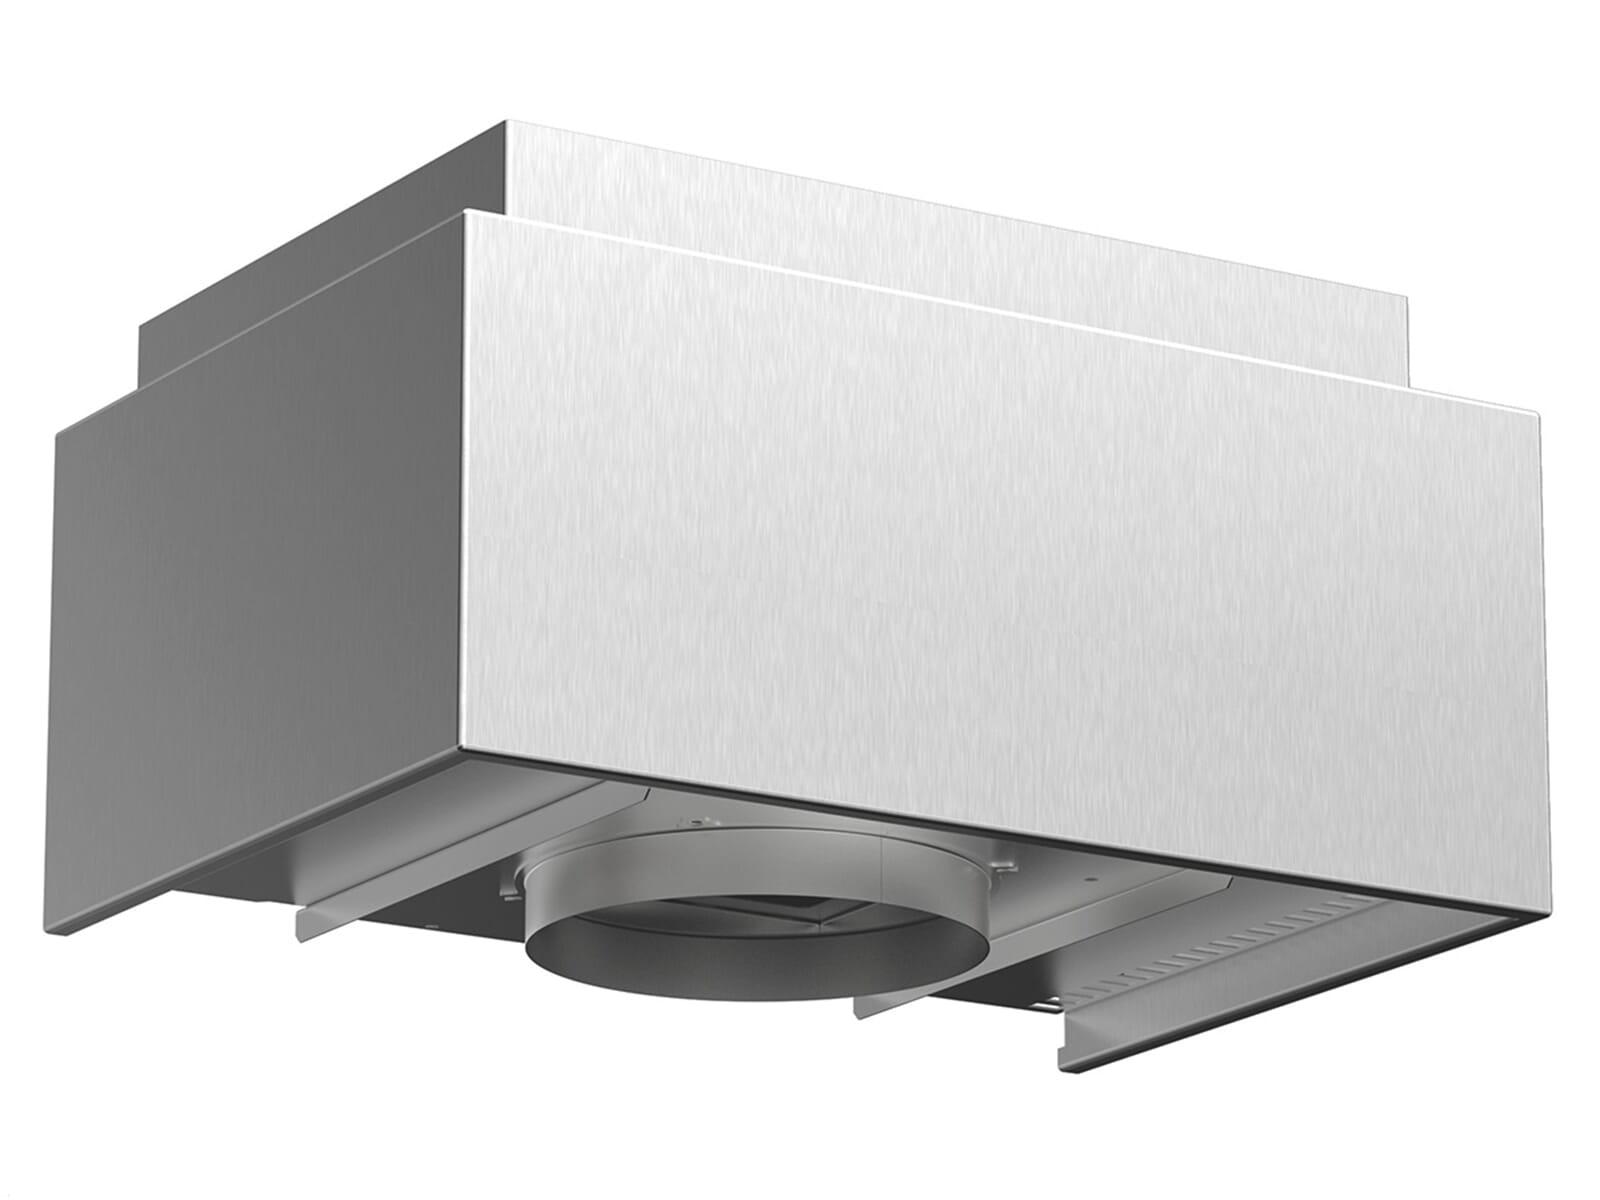 siemens lz57300 cleanair umluftkamin. Black Bedroom Furniture Sets. Home Design Ideas